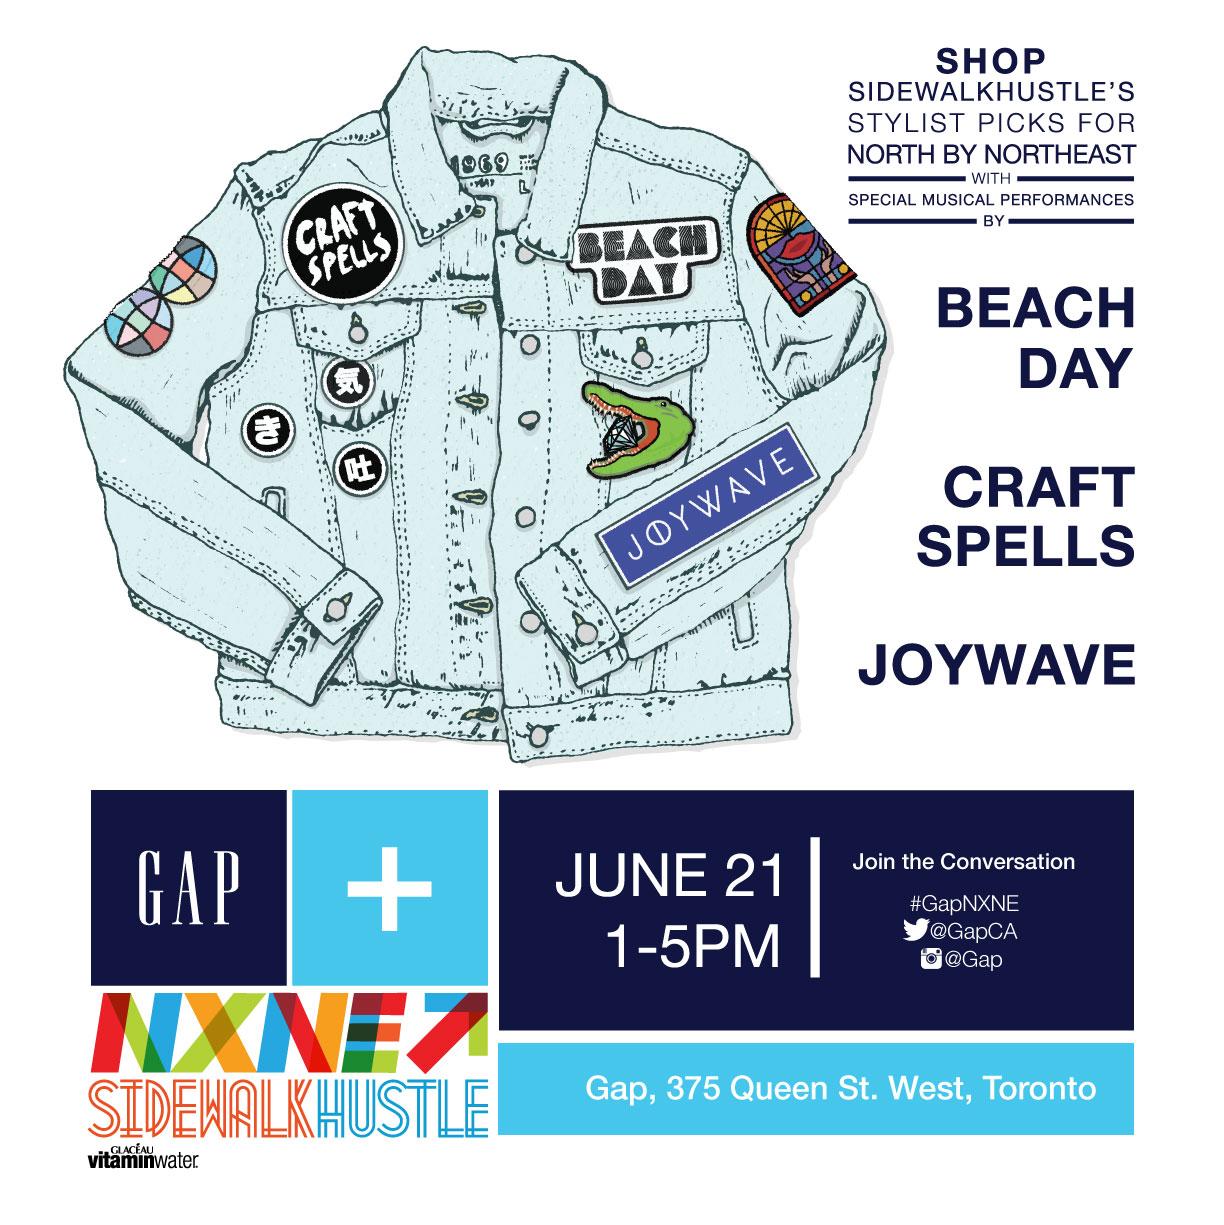 GAP x NXNE X Sidewalk Hustle Show June 21st